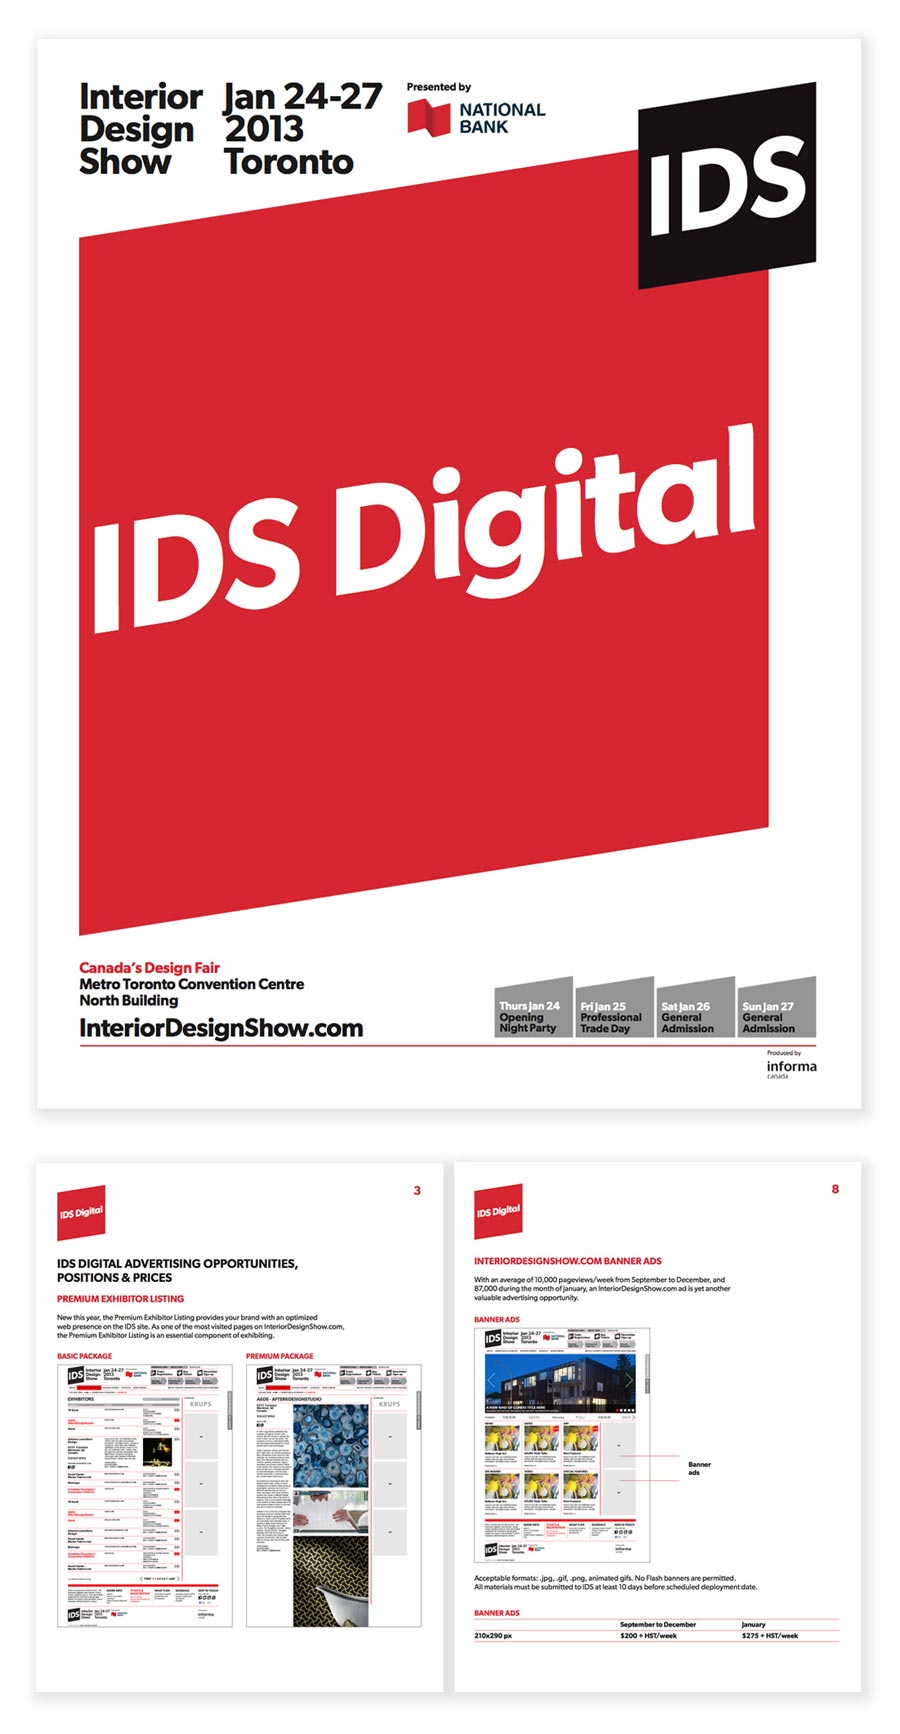 IDS-squarespace_001.jpg